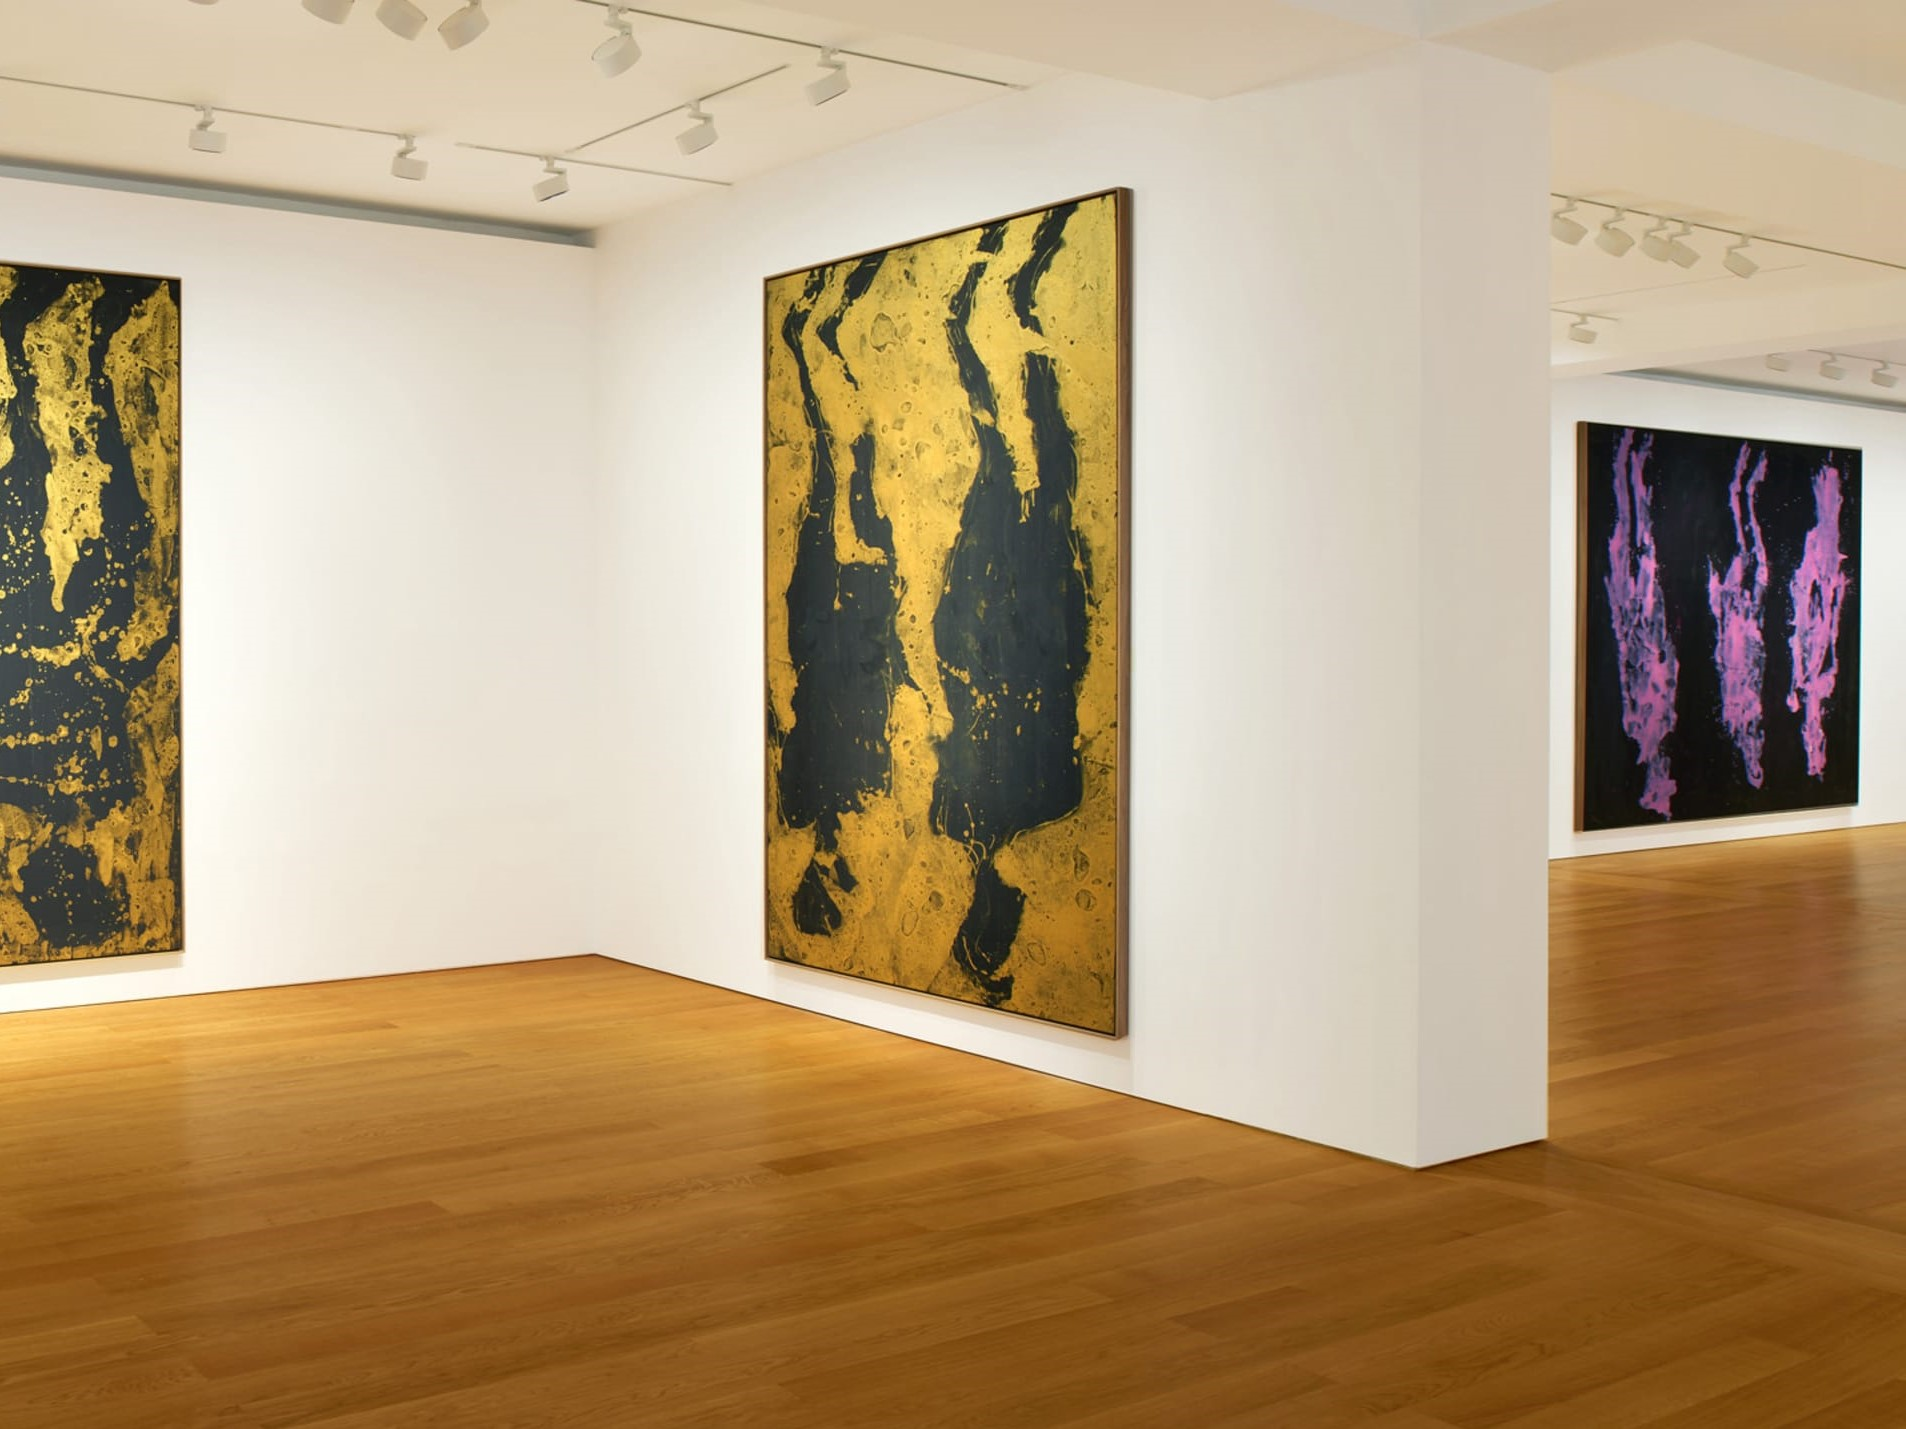 Картины Георга Базелица выставка